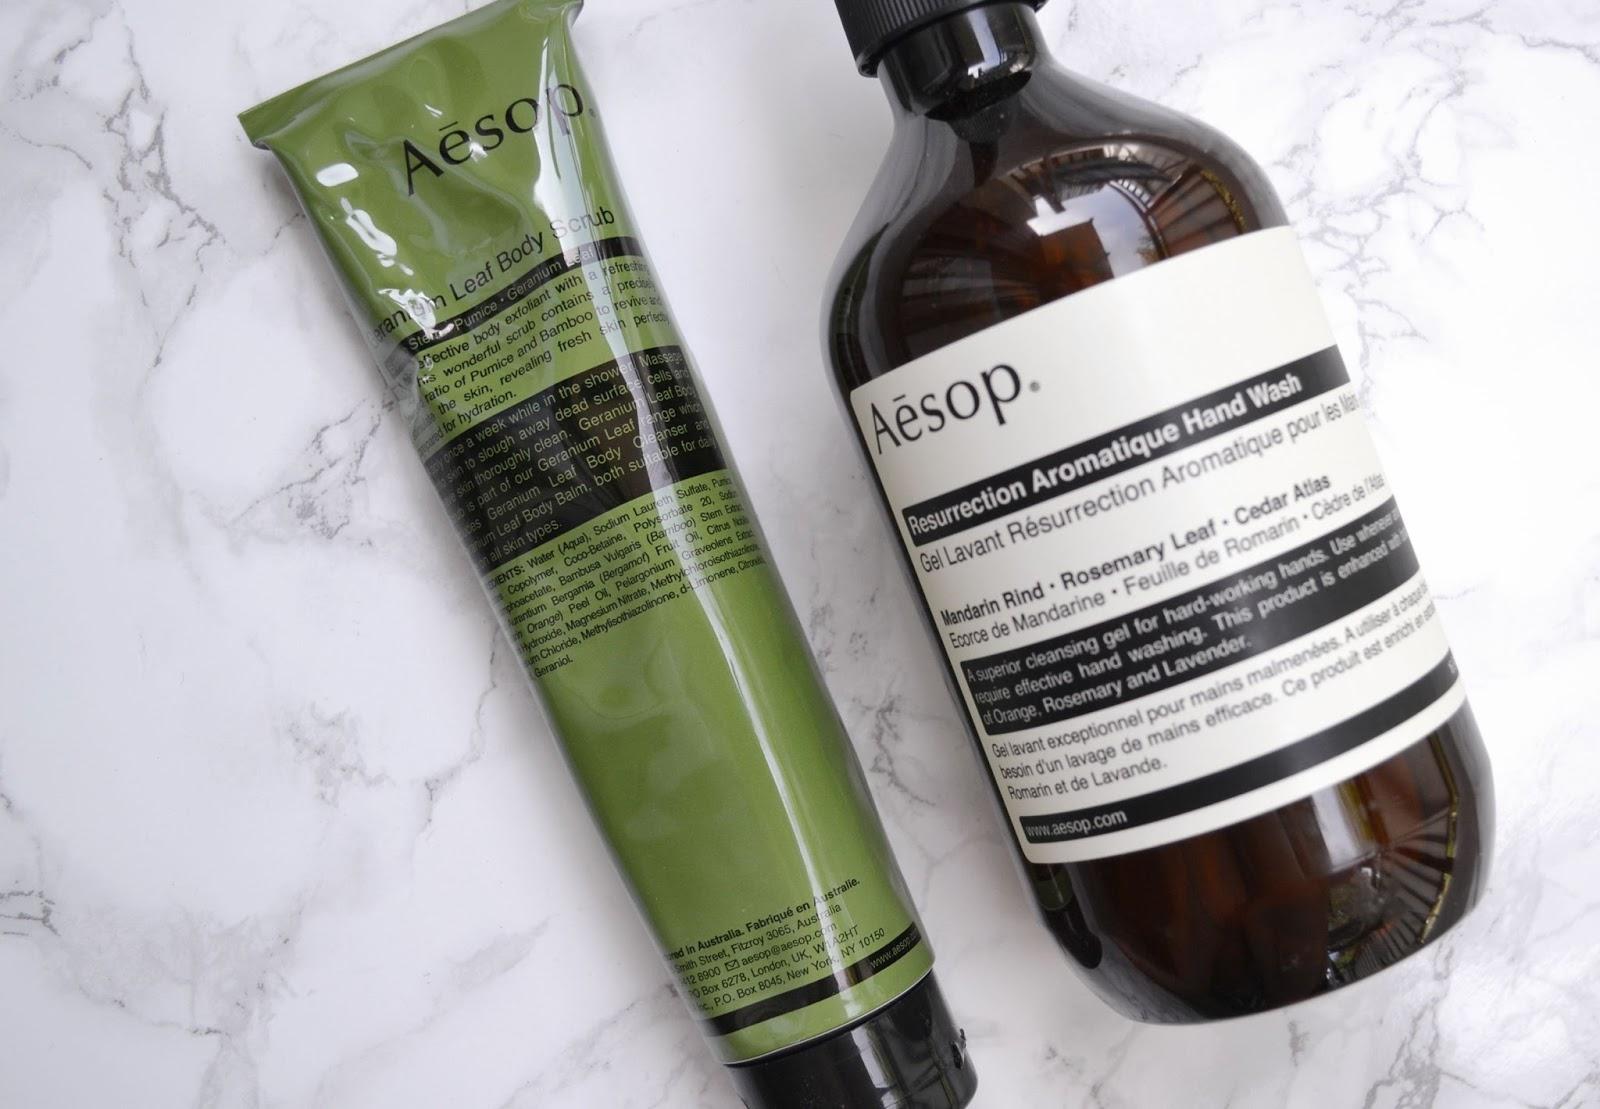 Aesop Geranium Leaf Body Scrub Resurrection Aromatic Hand Wash Review (1).jpg